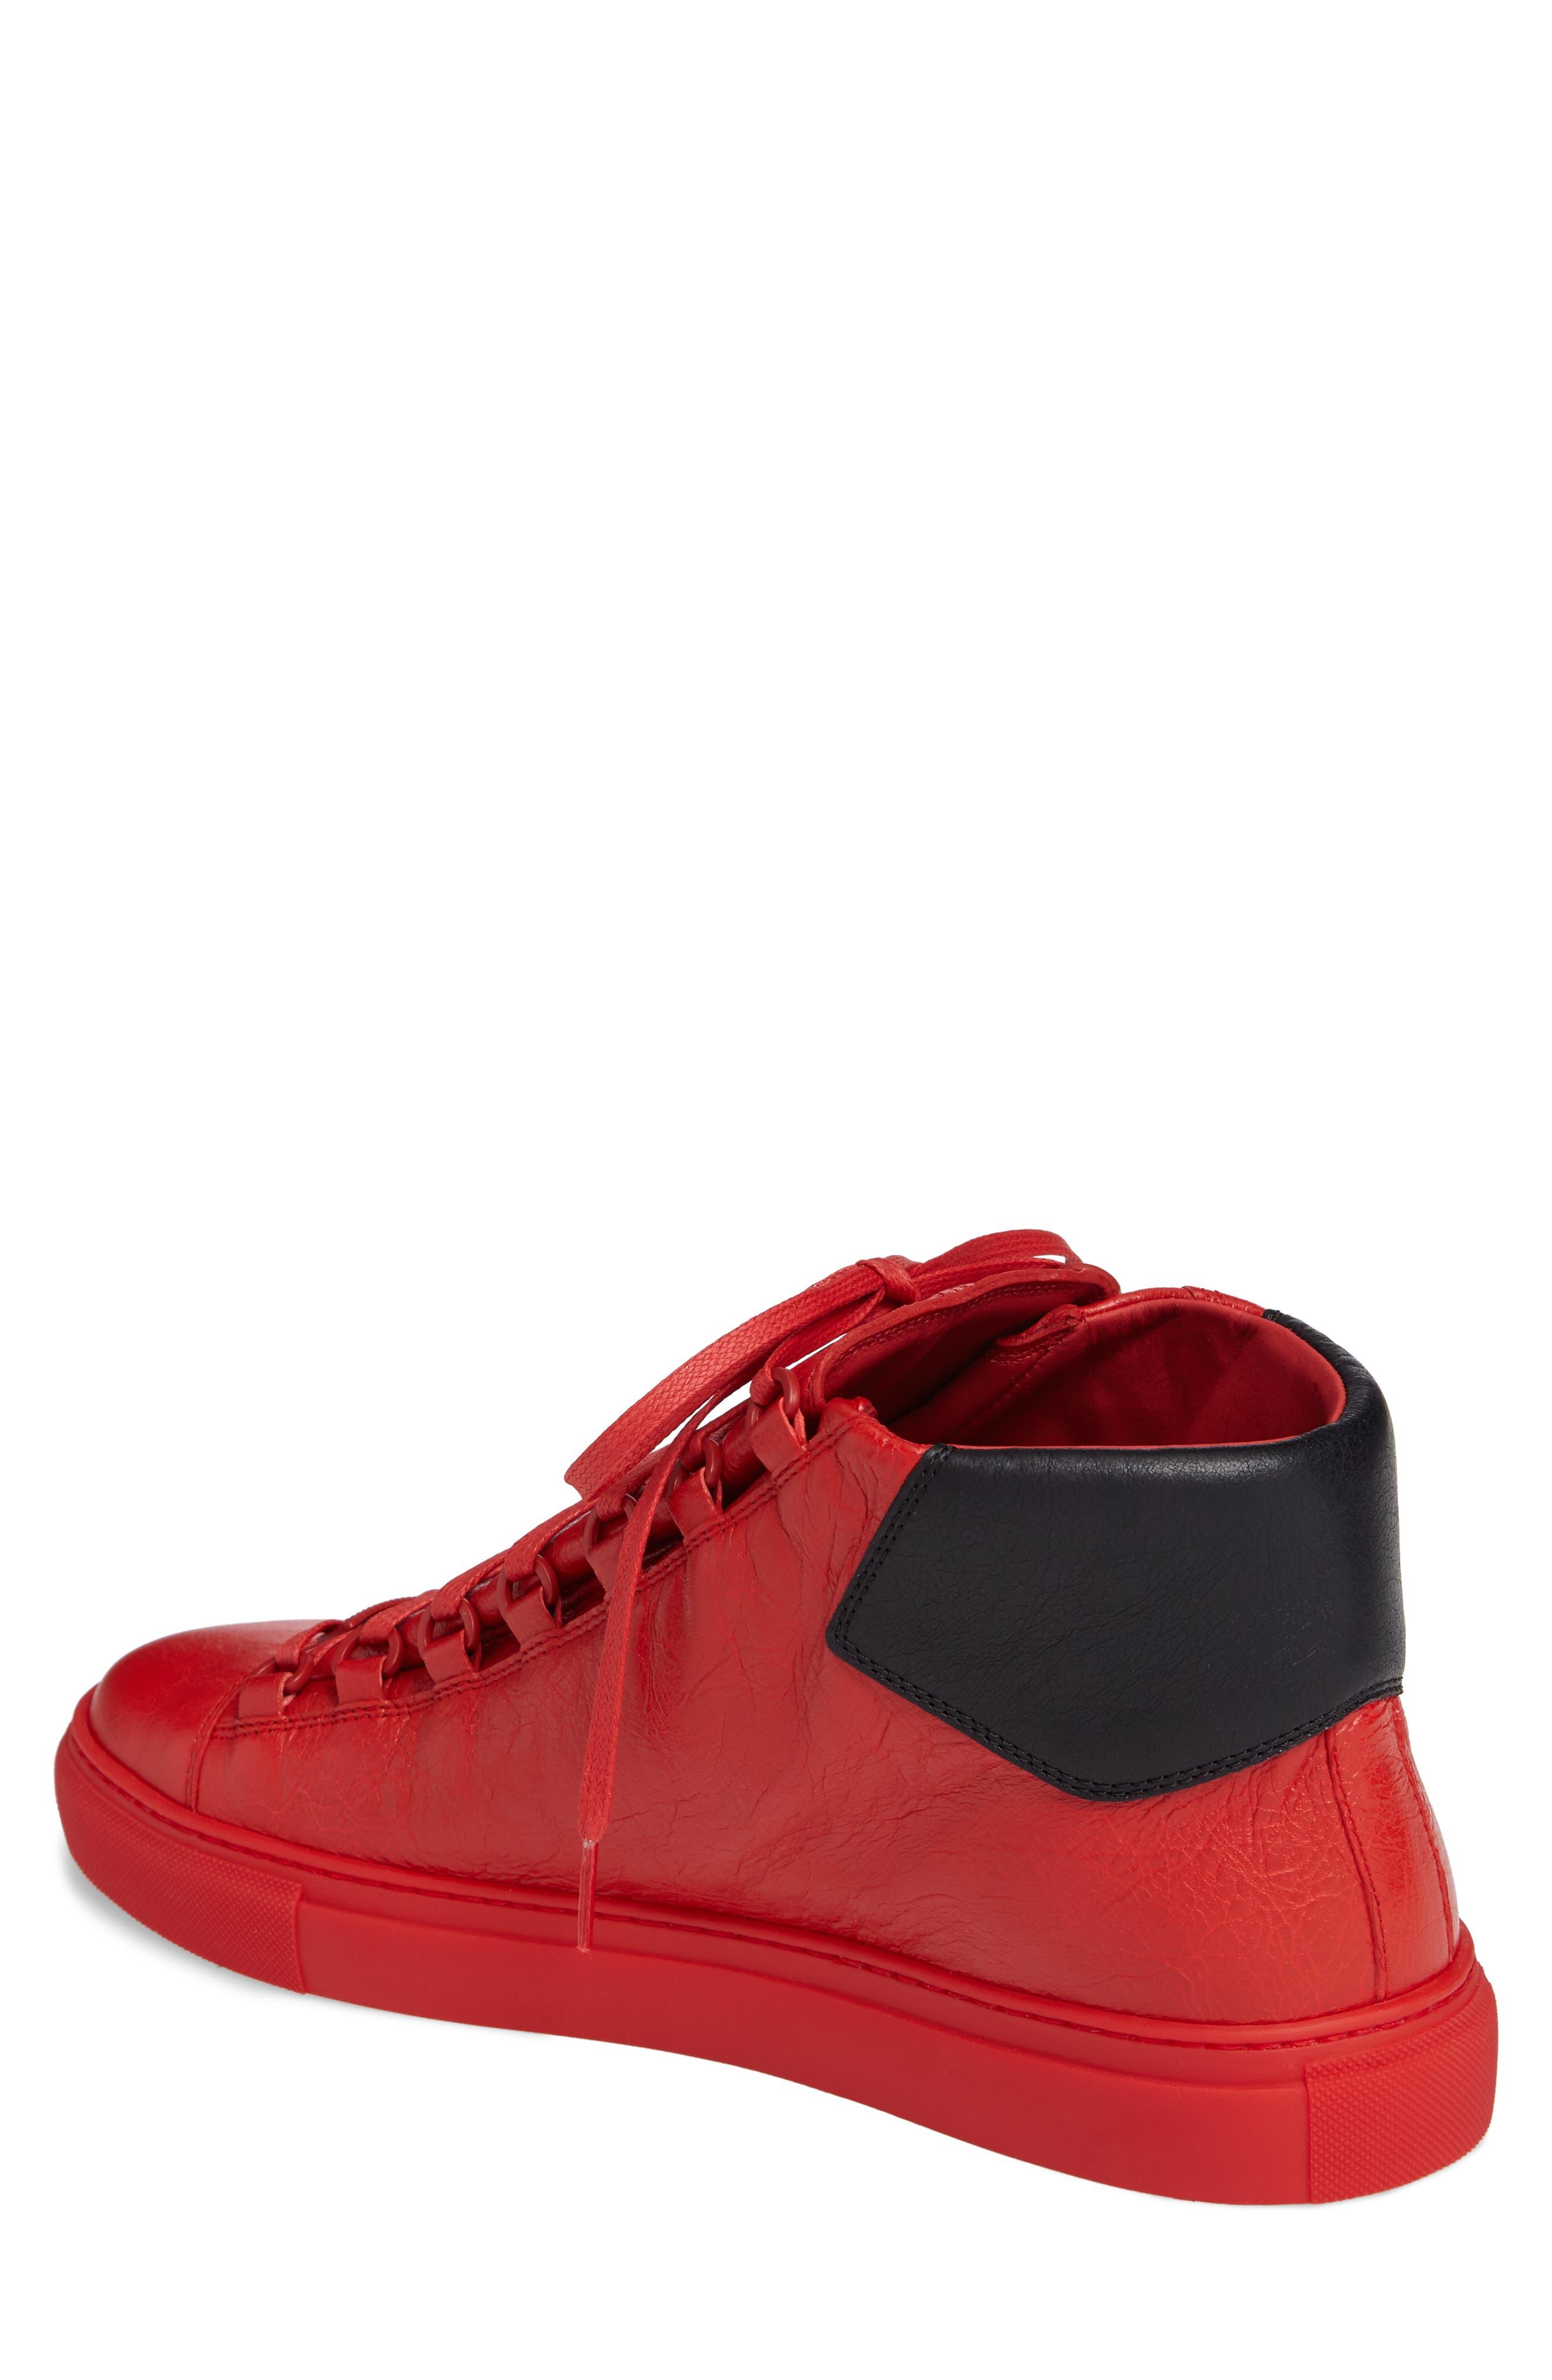 Arena High Sneaker,                             Alternate thumbnail 2, color,                             Rouge Paprika/ Noir Leather